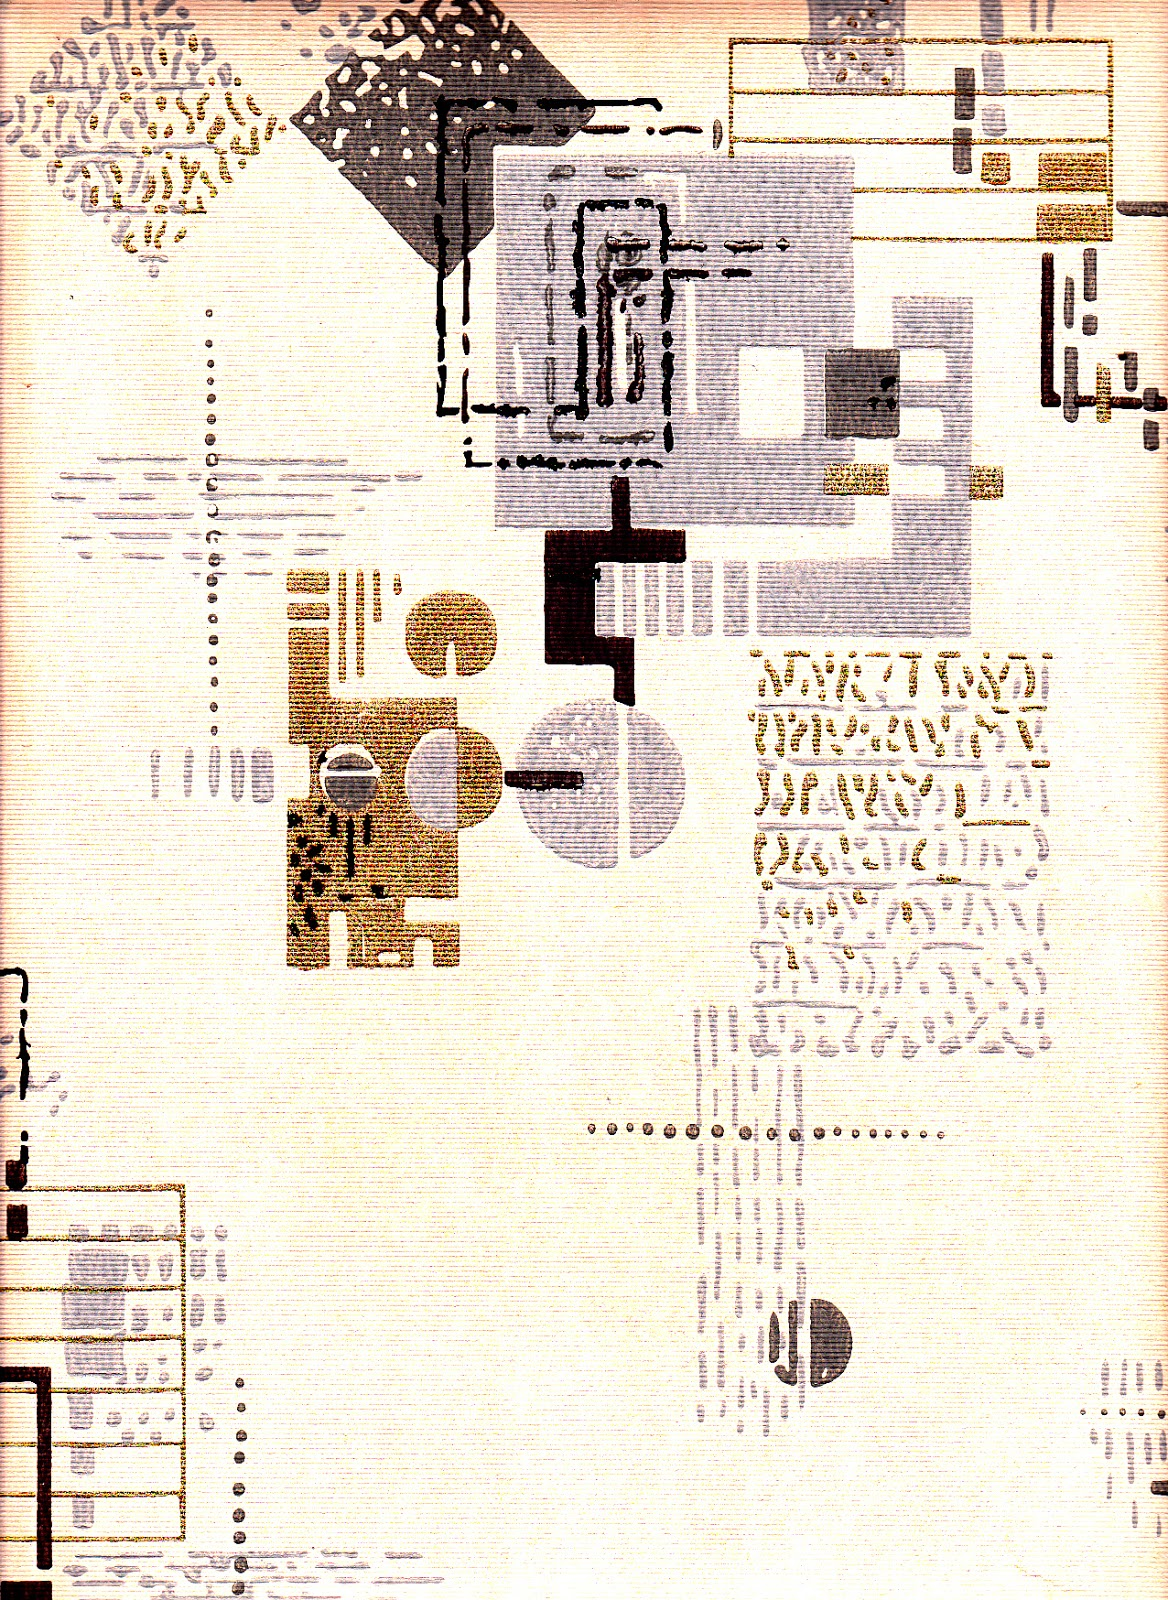 http://3.bp.blogspot.com/-UWax1Nt_ank/UTjmzUjHJLI/AAAAAAAAB44/vpIlABSfGgs/s1600/more+vintage+wallpaper_0007.jpg